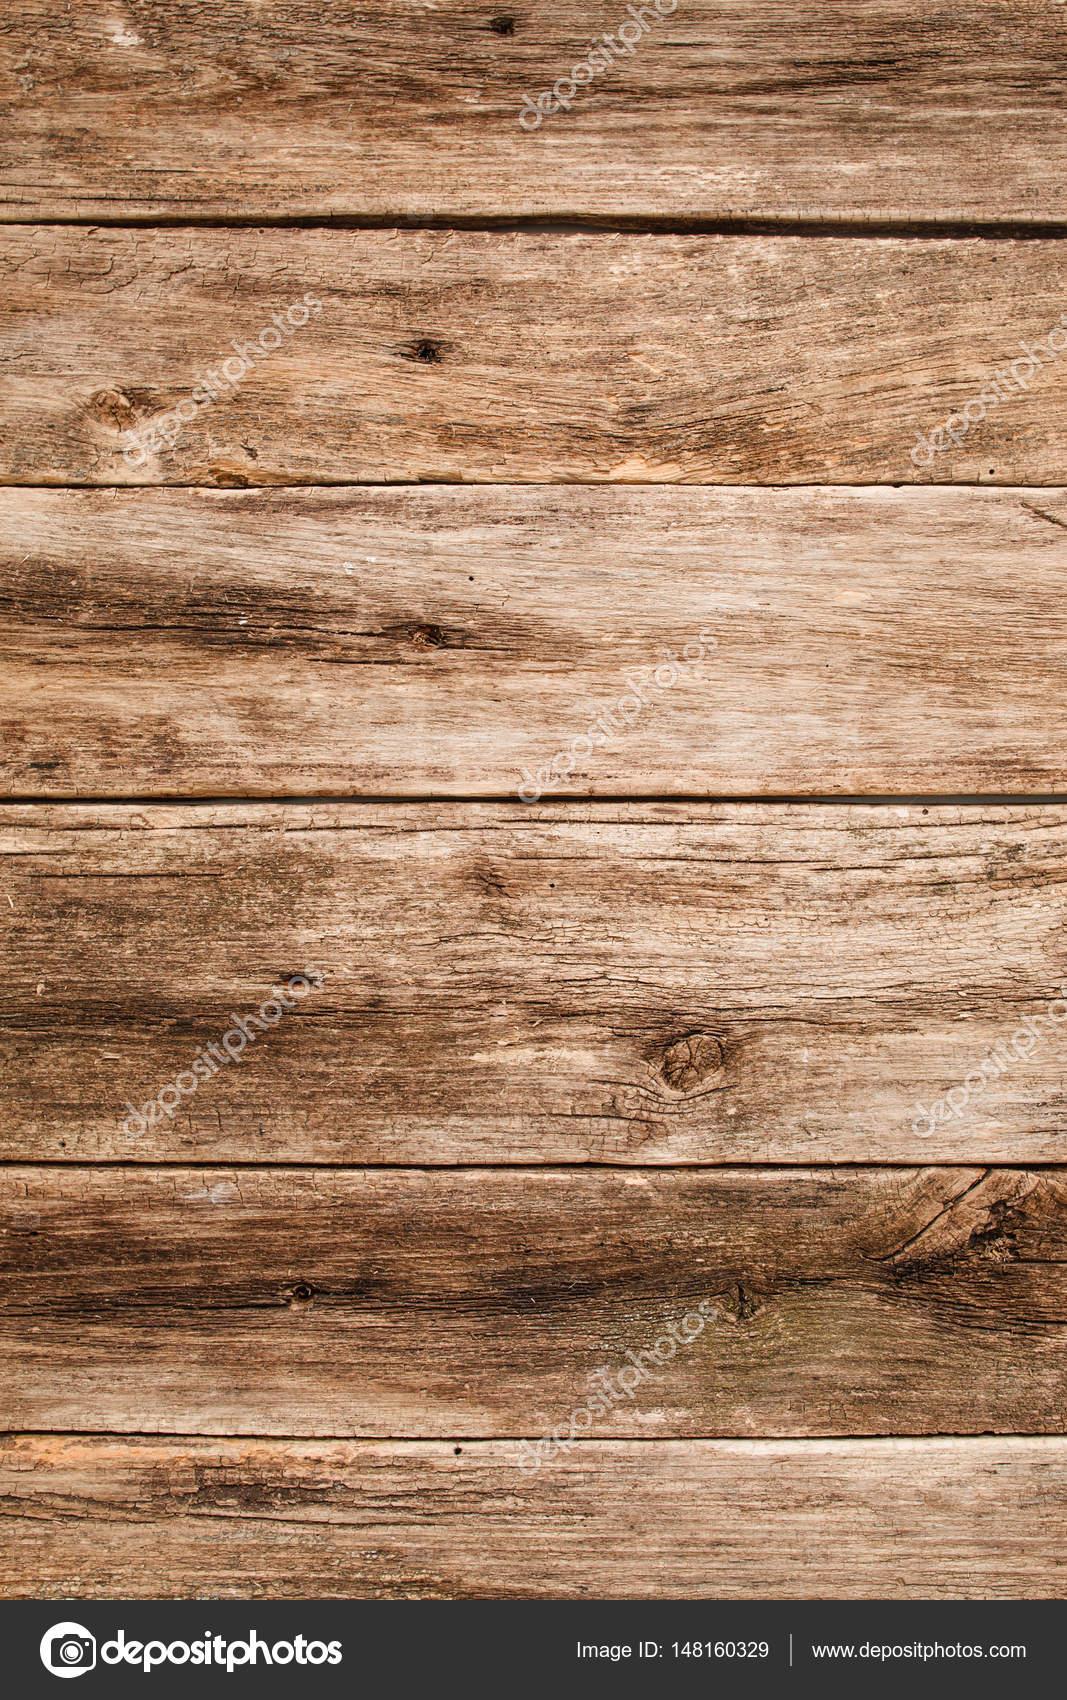 horizontal wood background. Old Wooden Background, Horizontal Planks Position \u2014 Stock Photo Wood Background D